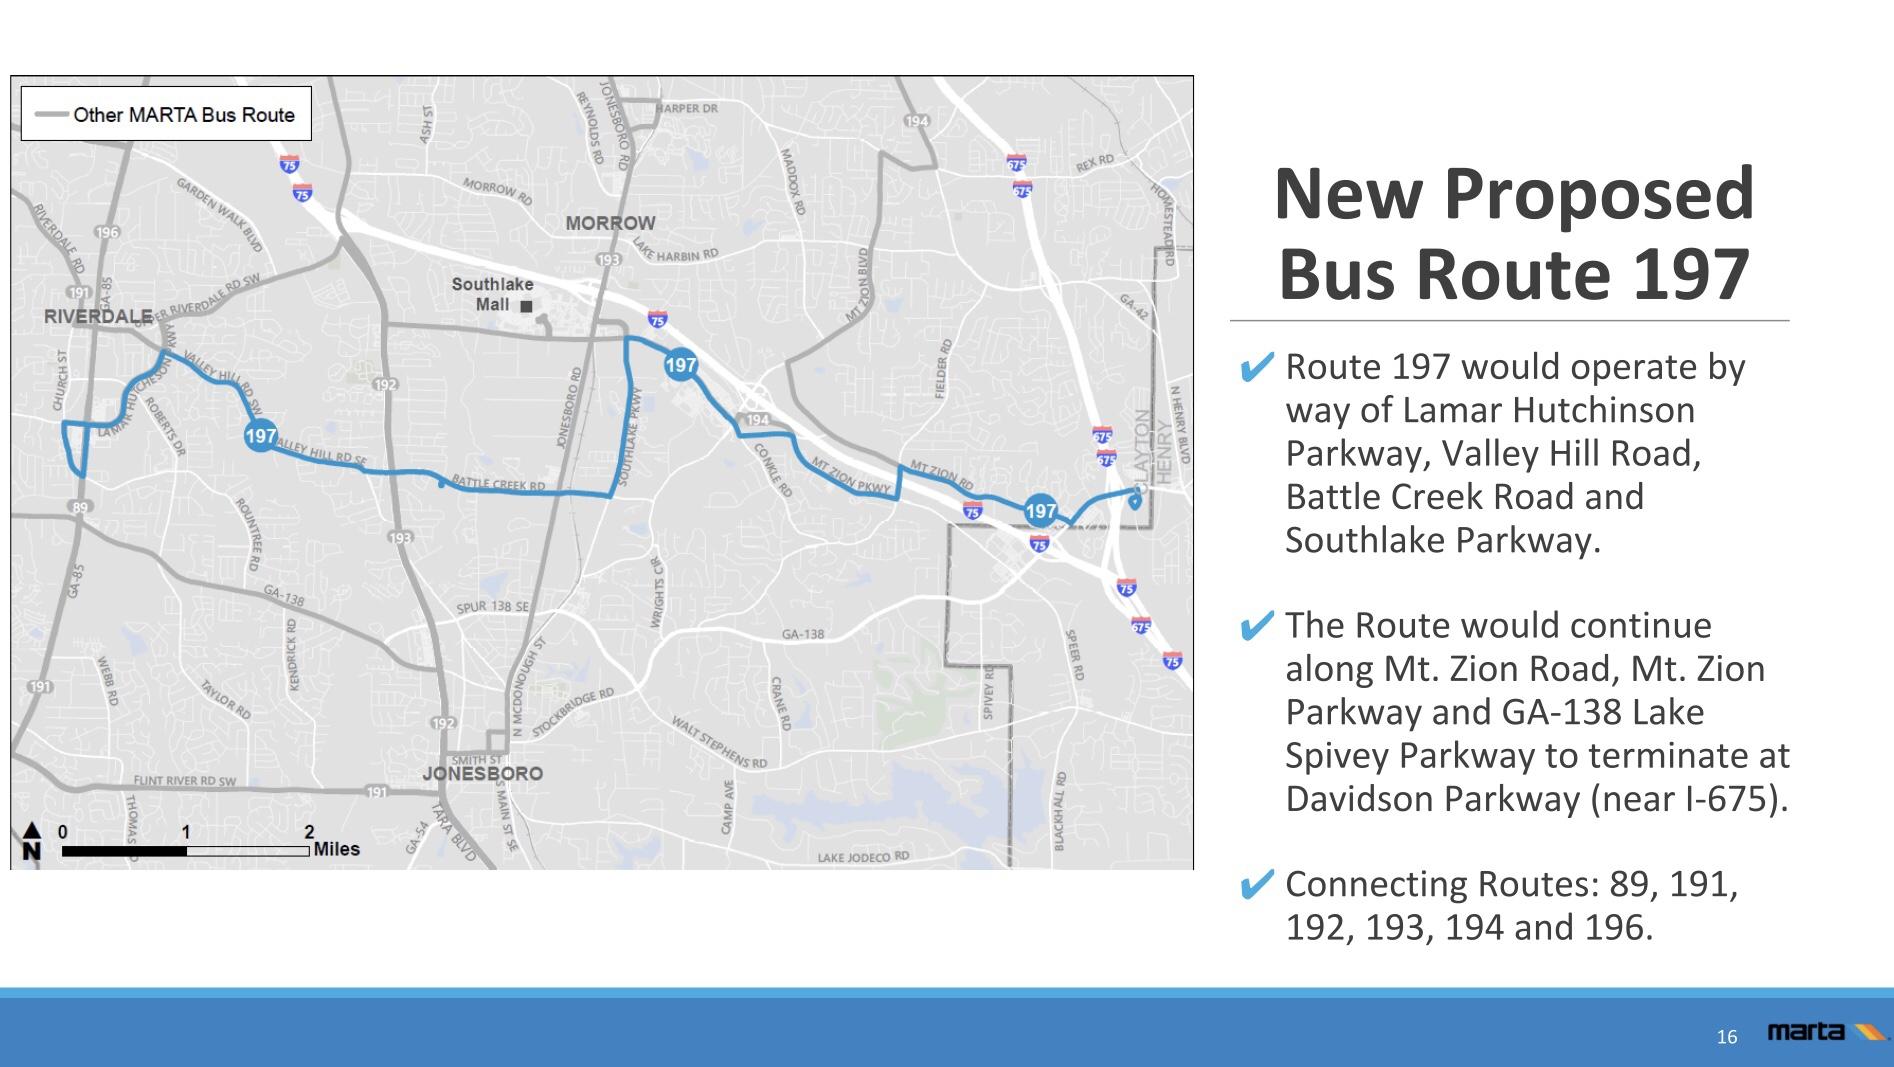 Presentation slide showing proposed MARTA bus route 197 (MARTA photo)